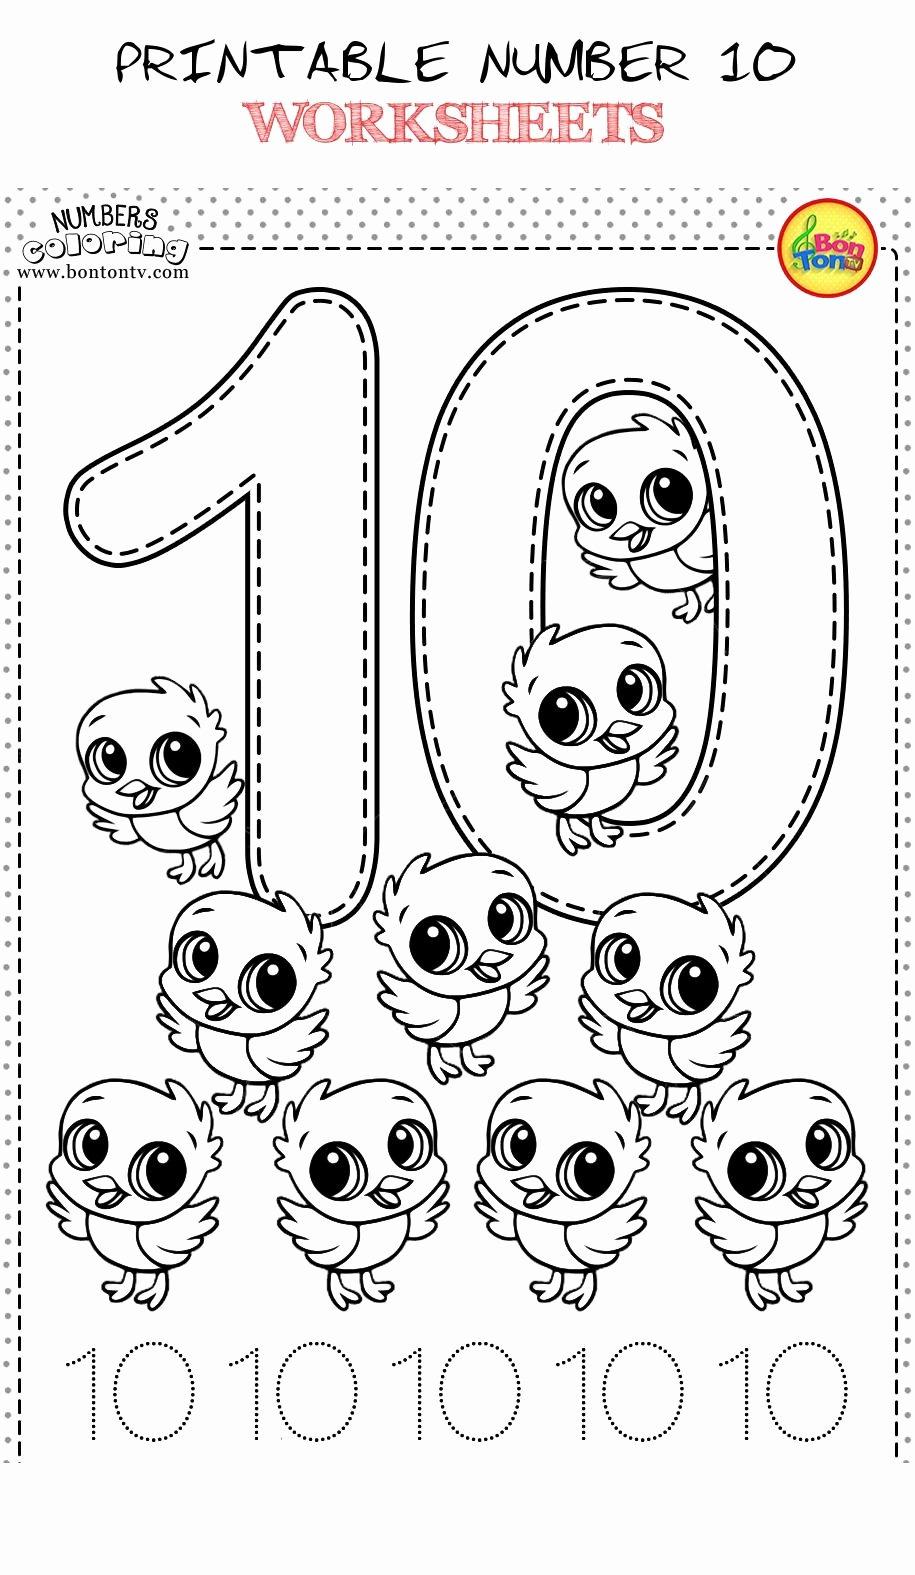 Number 10 Worksheets for Preschoolers Fresh Printable Number 10 Worksheets 5 Kids Fun Worksheets